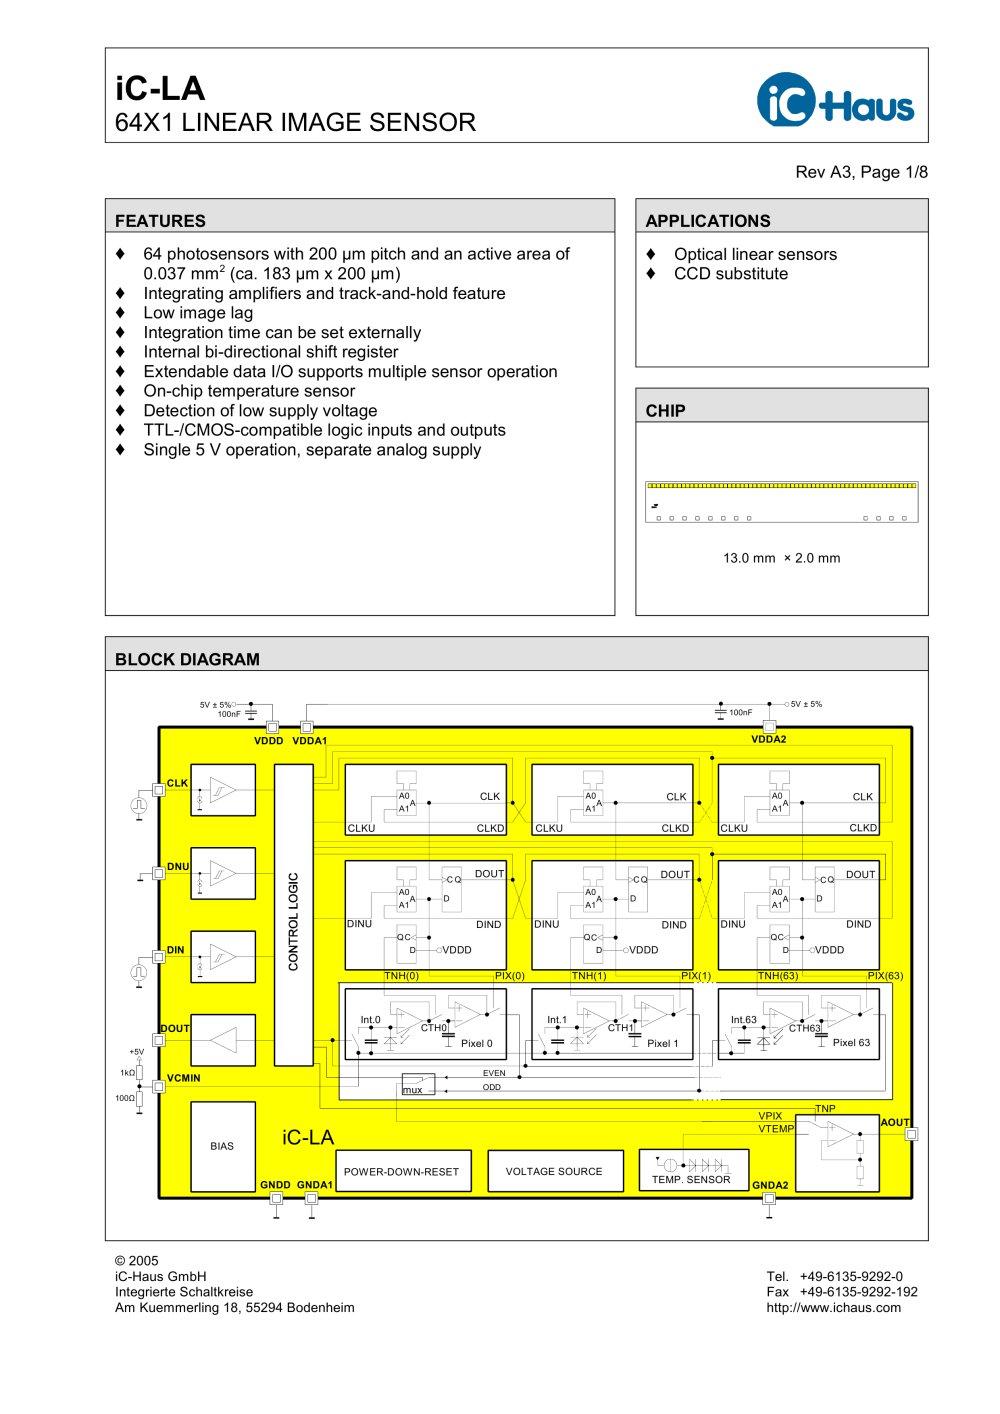 iC-LA 64x1 Linear Image Sensor with Bidirectional Shift and ...